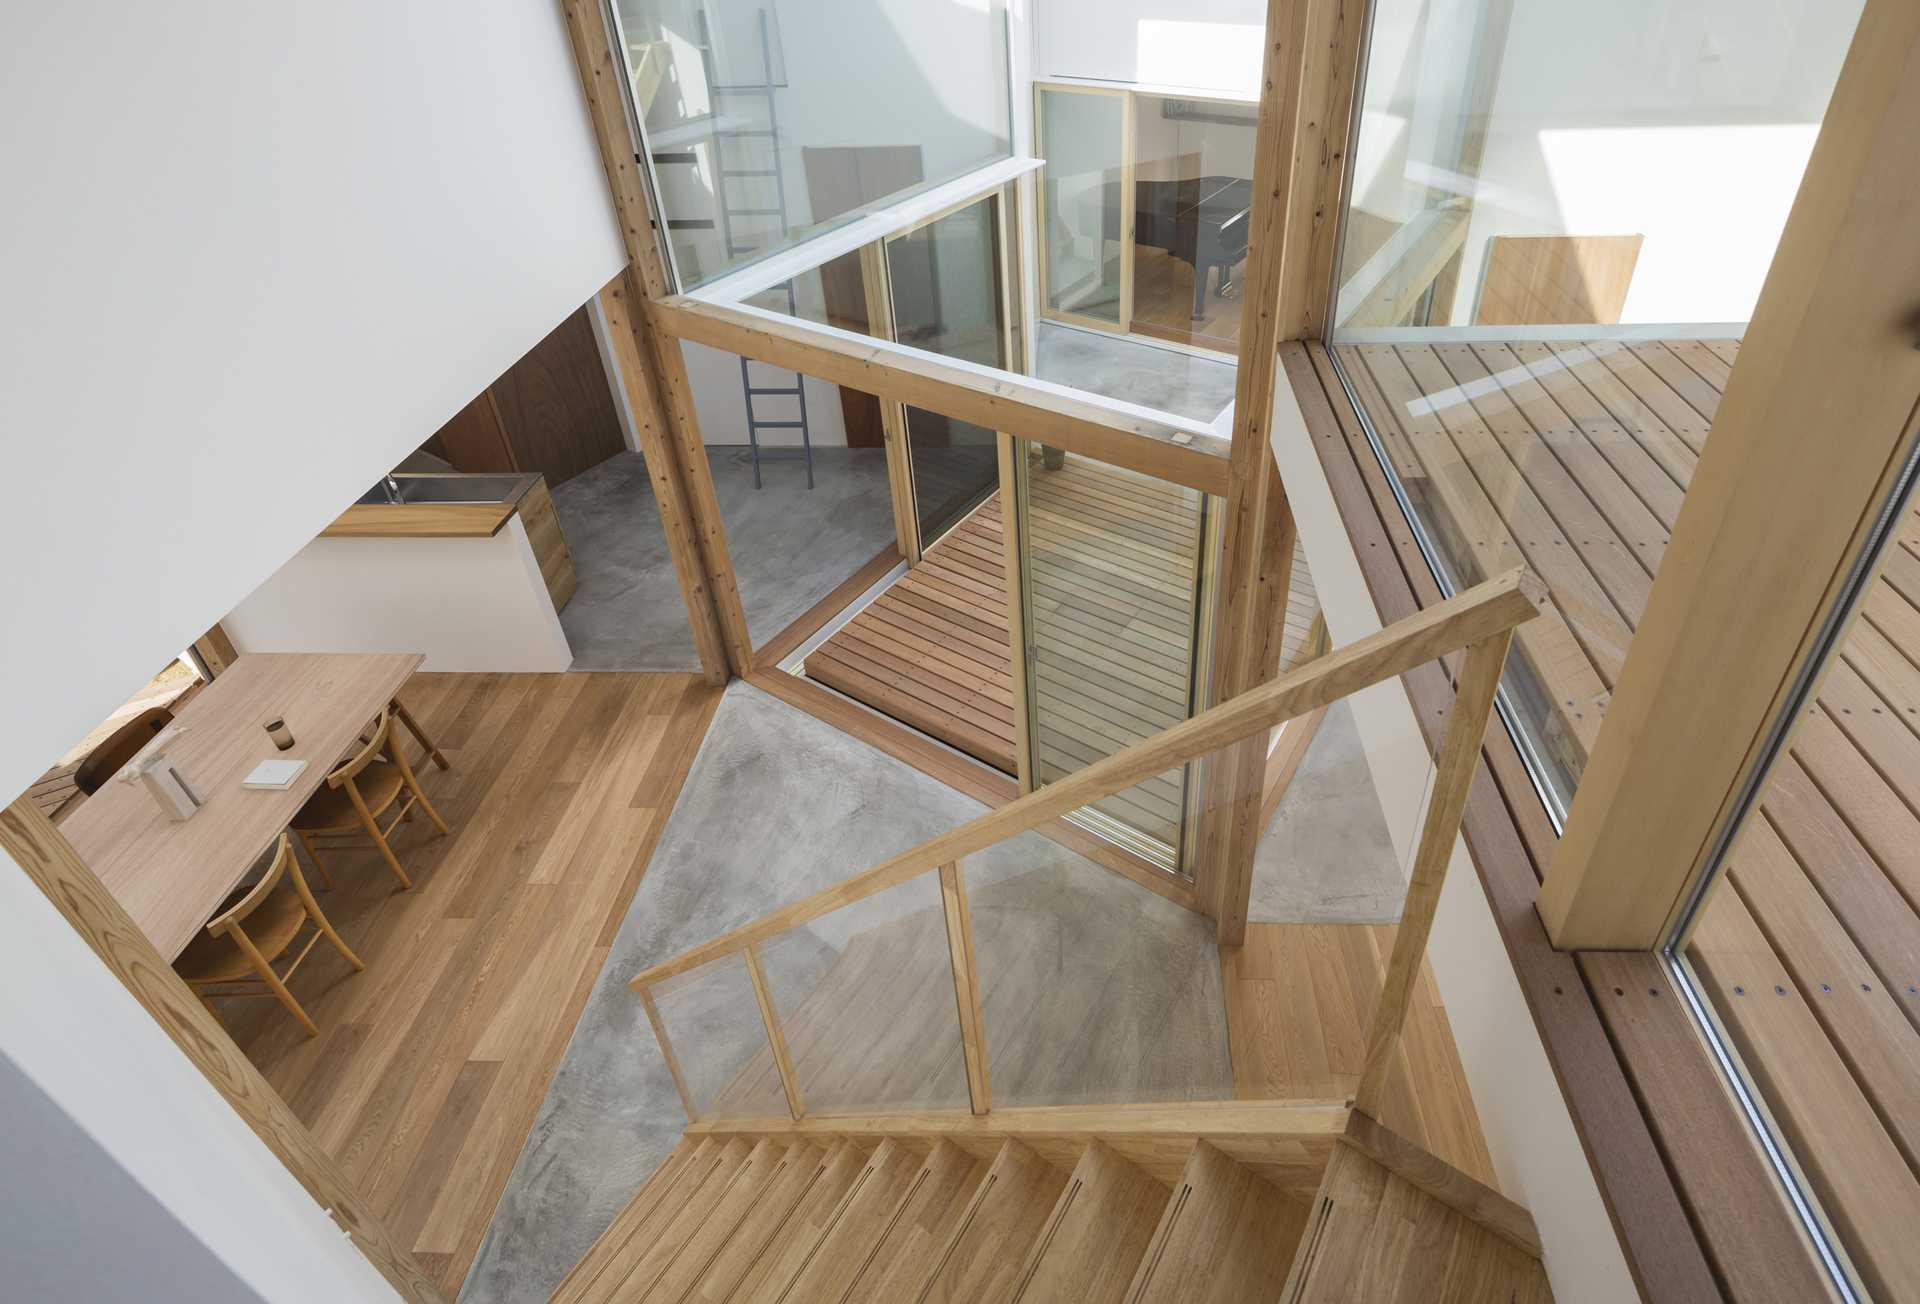 House in Hokusetsu  - 40 8 47